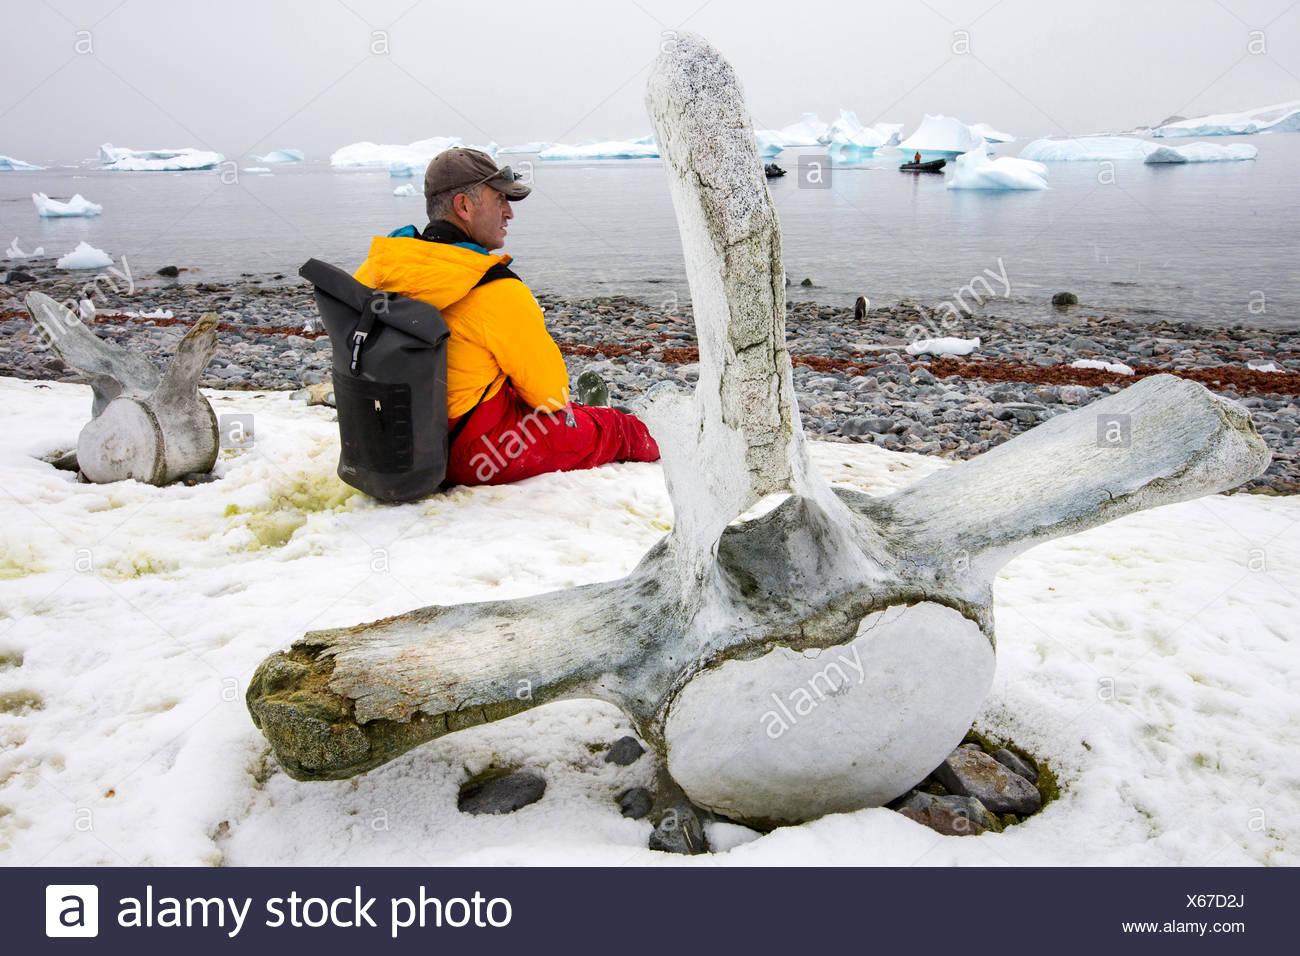 Man sitting near whale vertebrae, Curverville Island, Antarctica - Stock Image